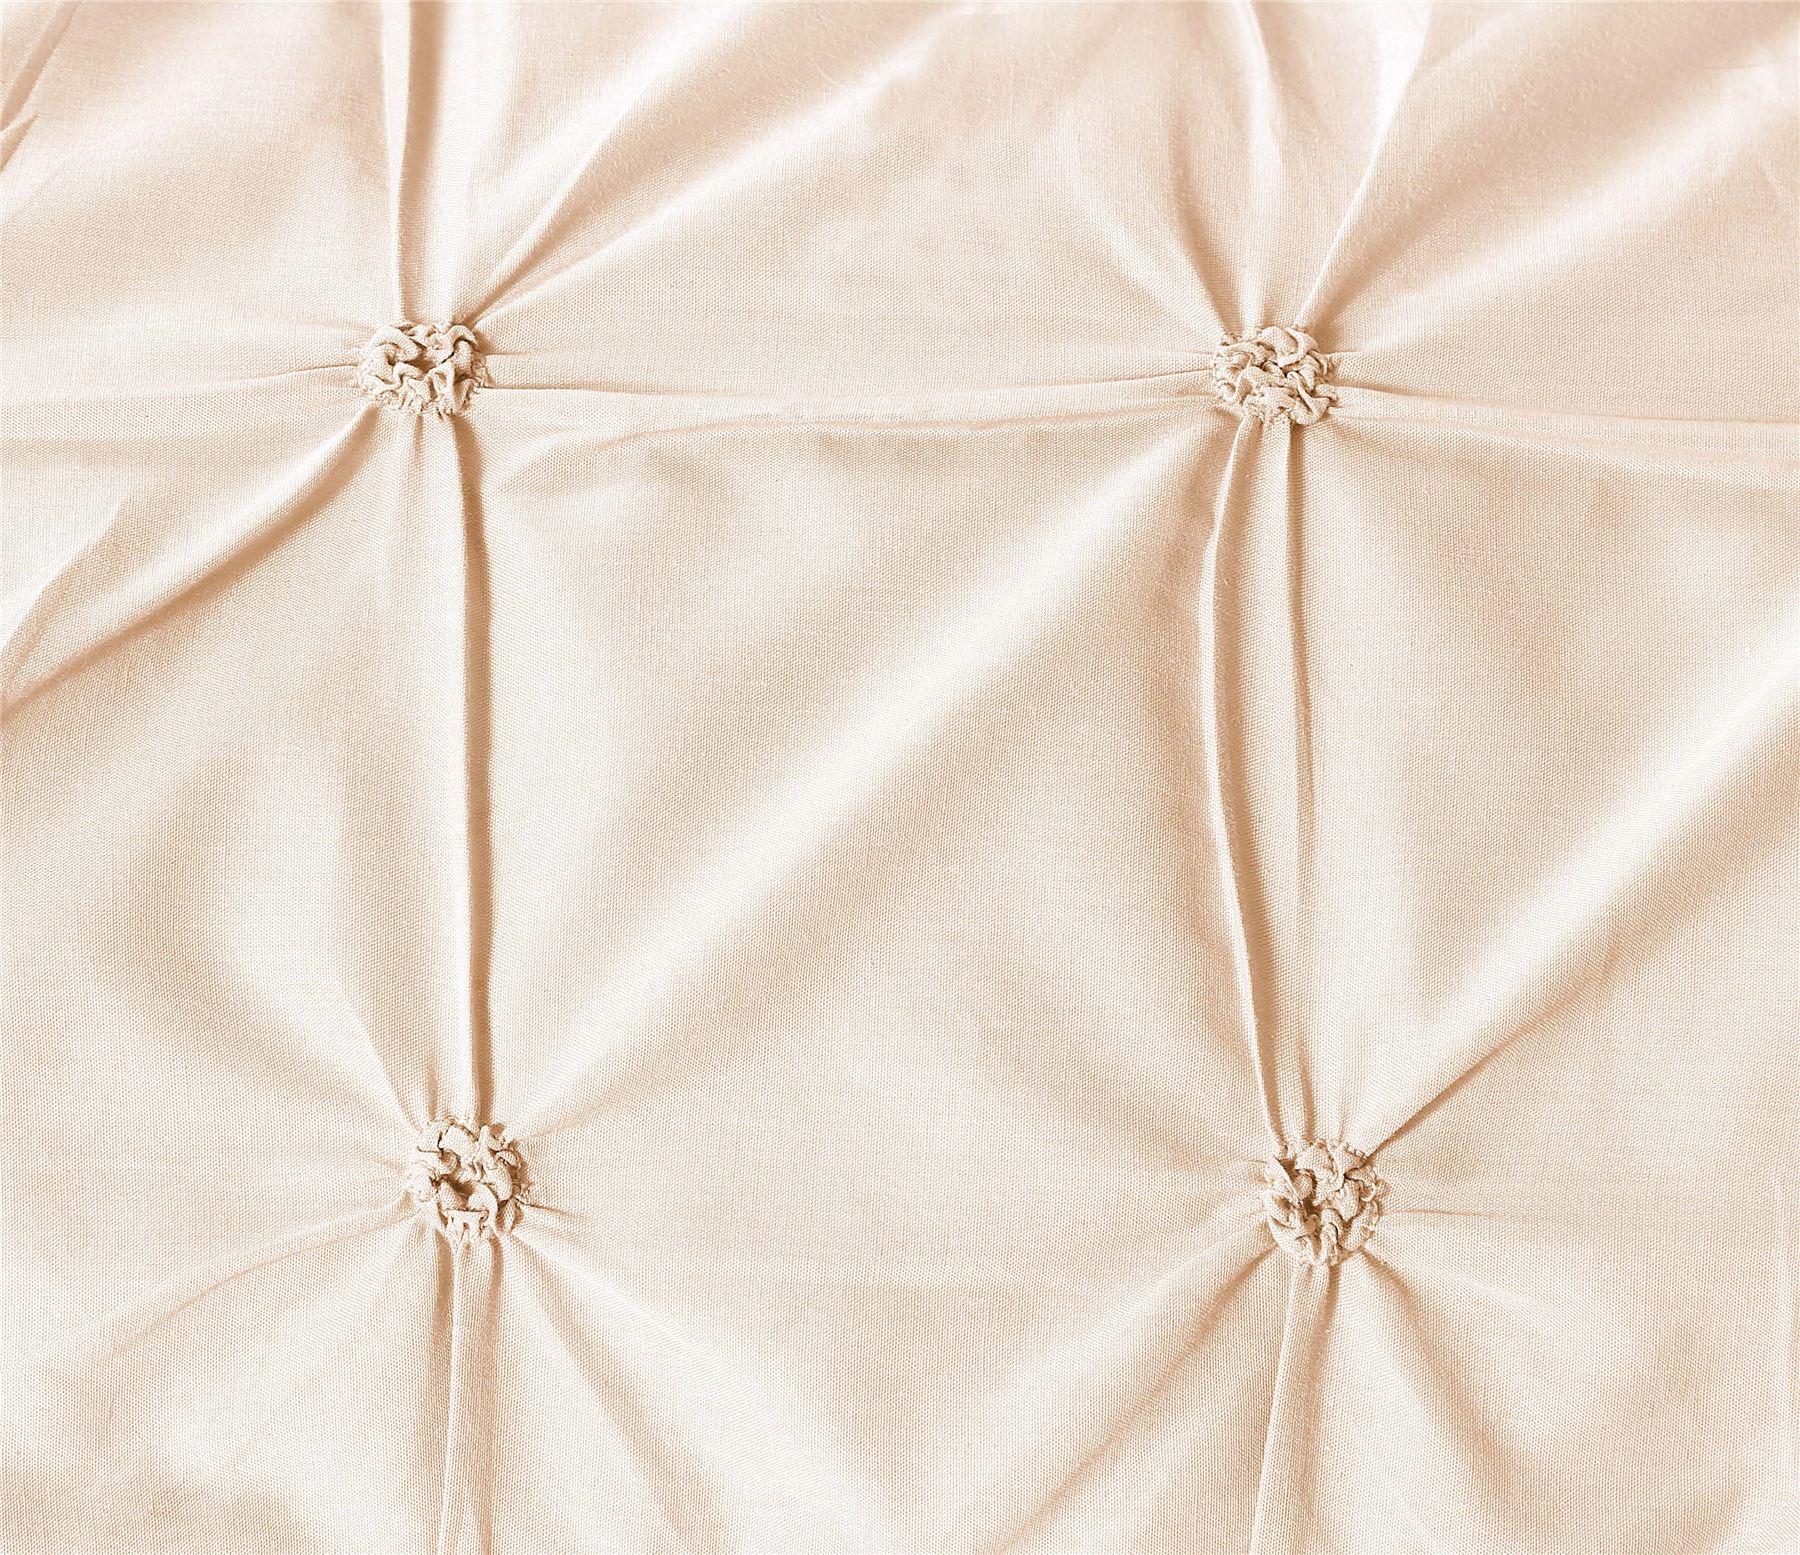 Jones-confeccion-adornado-cubierta-edredon-edredon-de-Mezcla-de-Algodon-Set-Rose-amp-Ostra miniatura 6